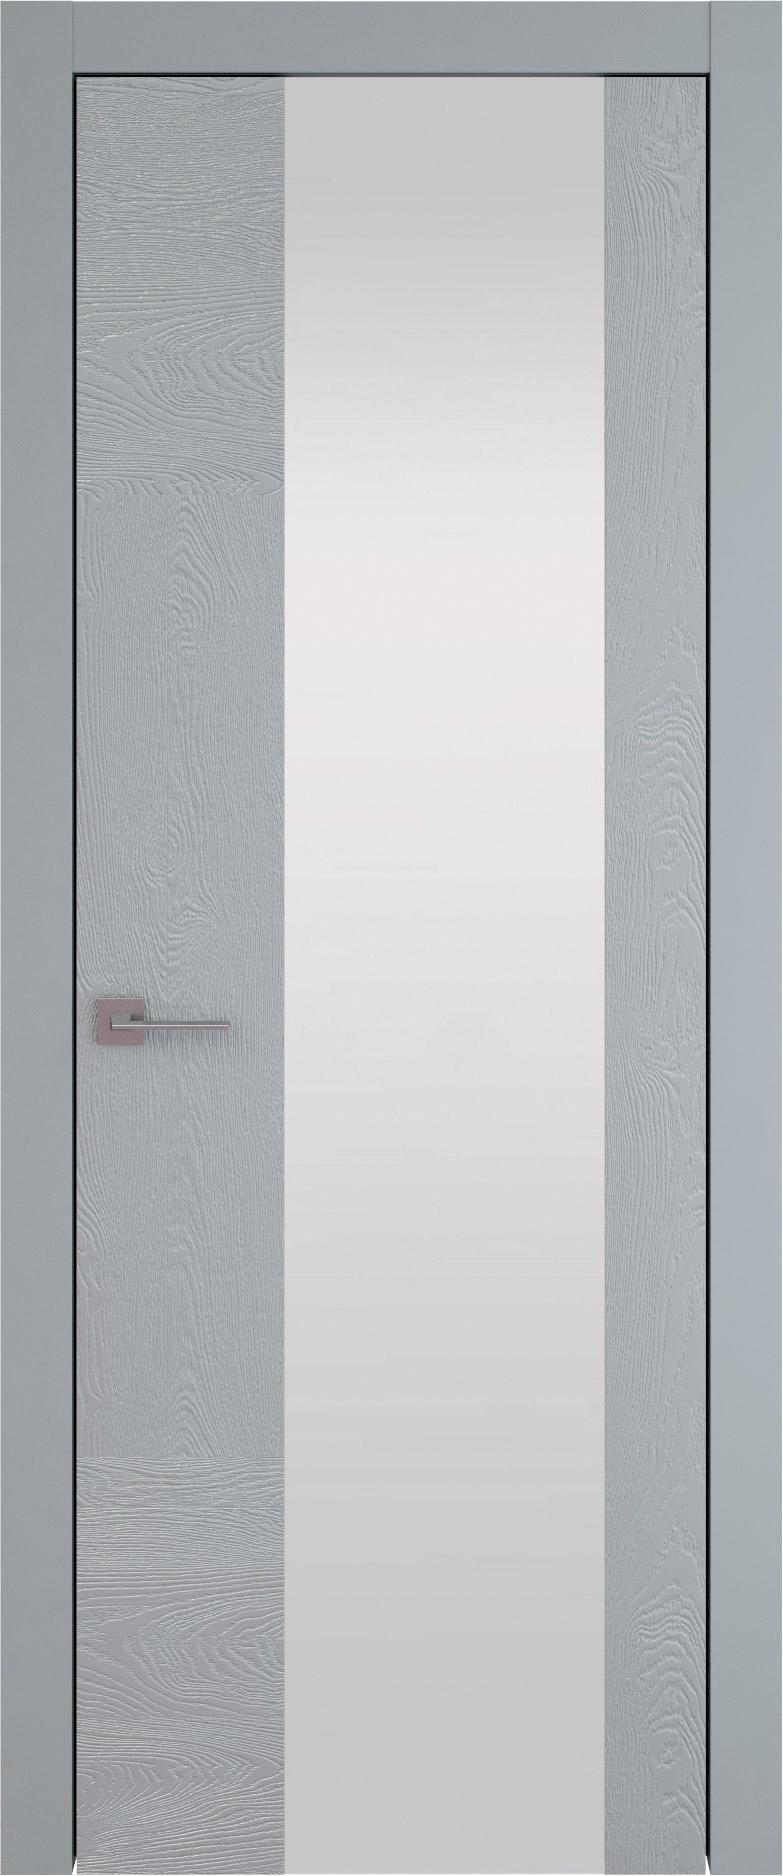 Tivoli Е-1 цвет - Серебристо-серая эмаль по шпону (RAL 7045) Со стеклом (ДО)